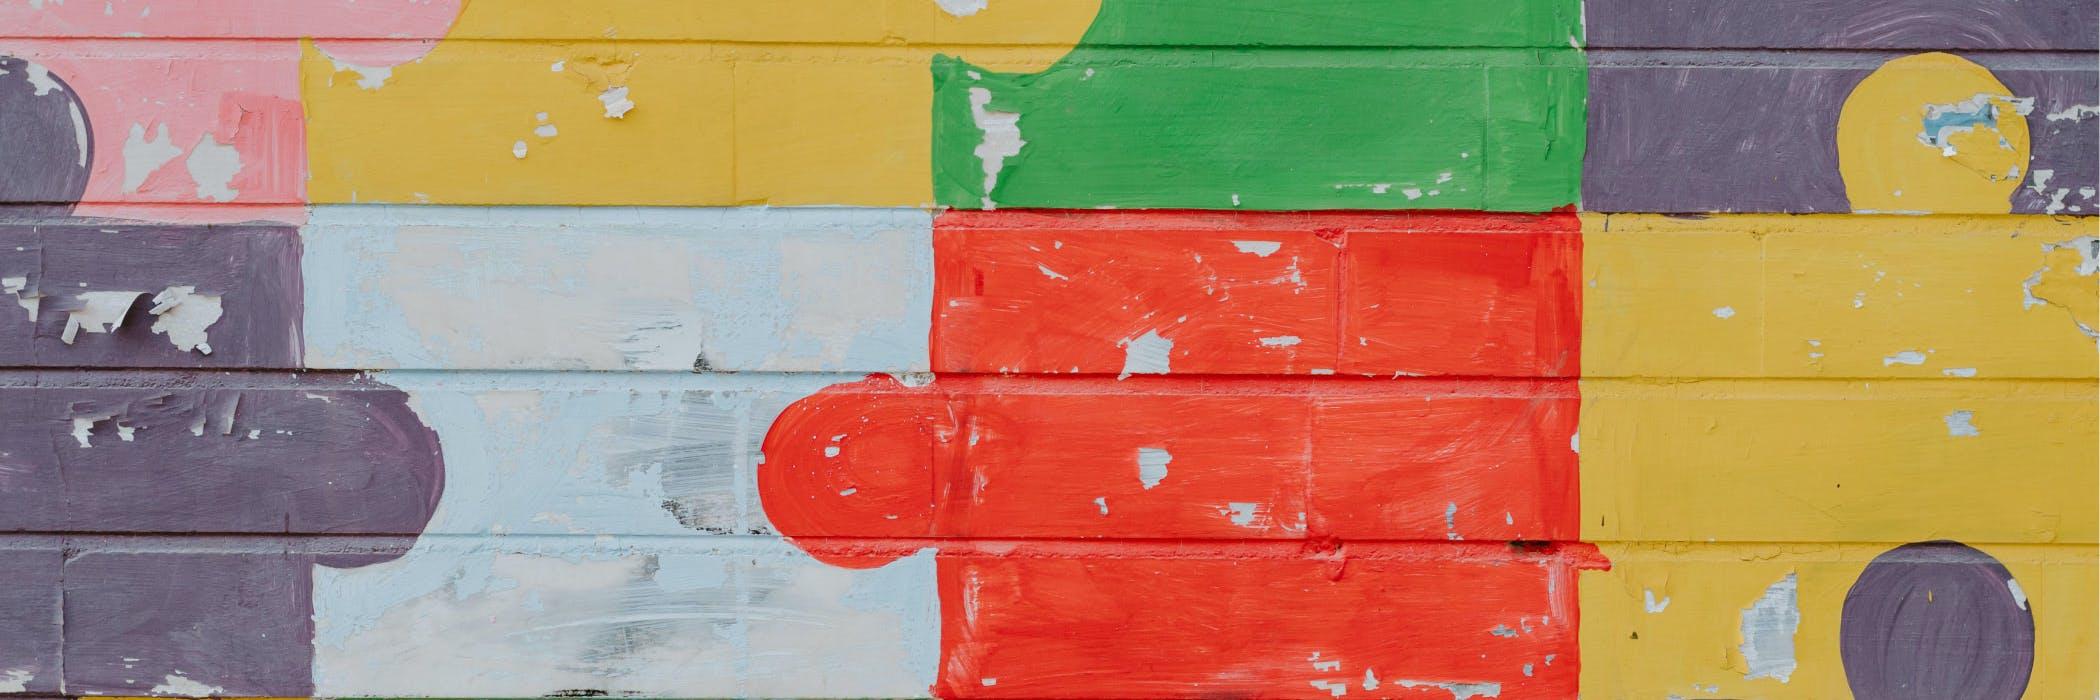 Colorful puzzle piece mural